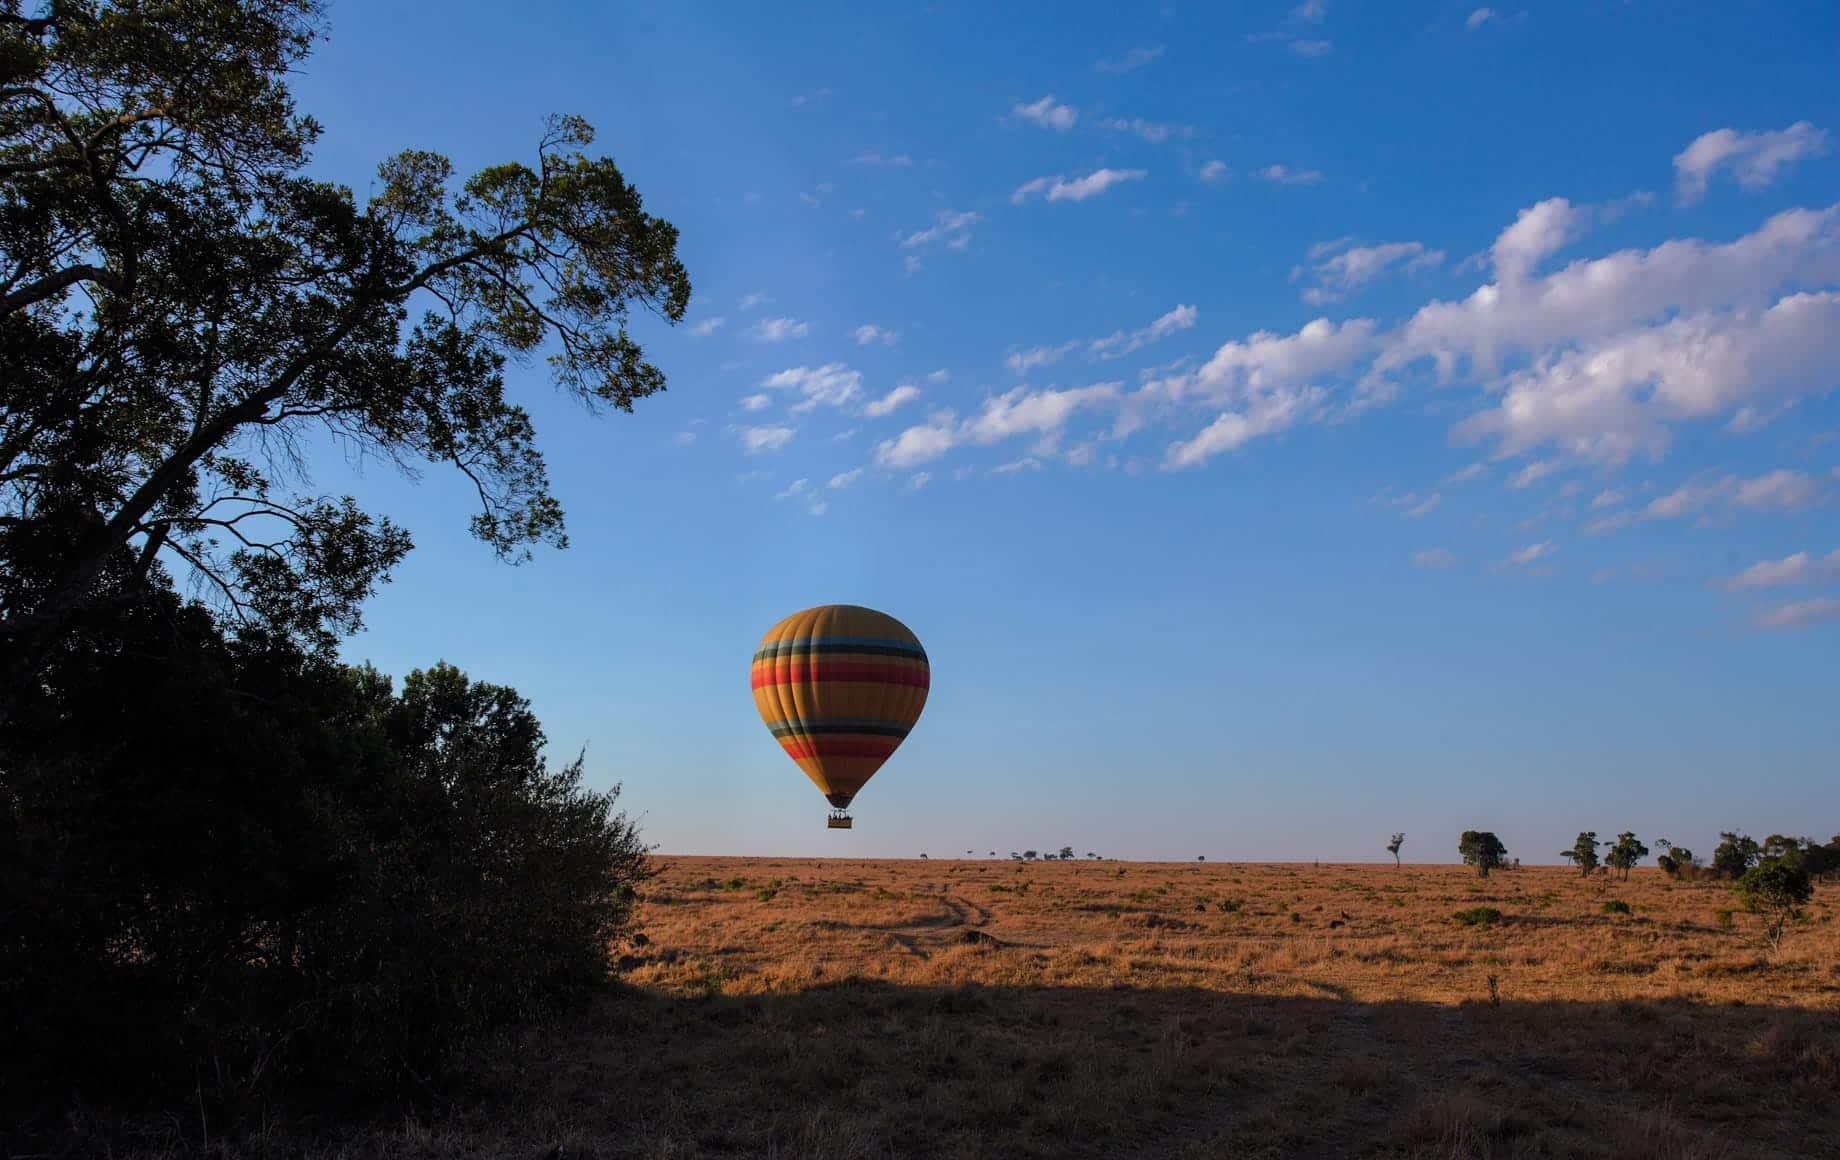 Hot air balloons at Fairmont Mount Kenya Safari Club